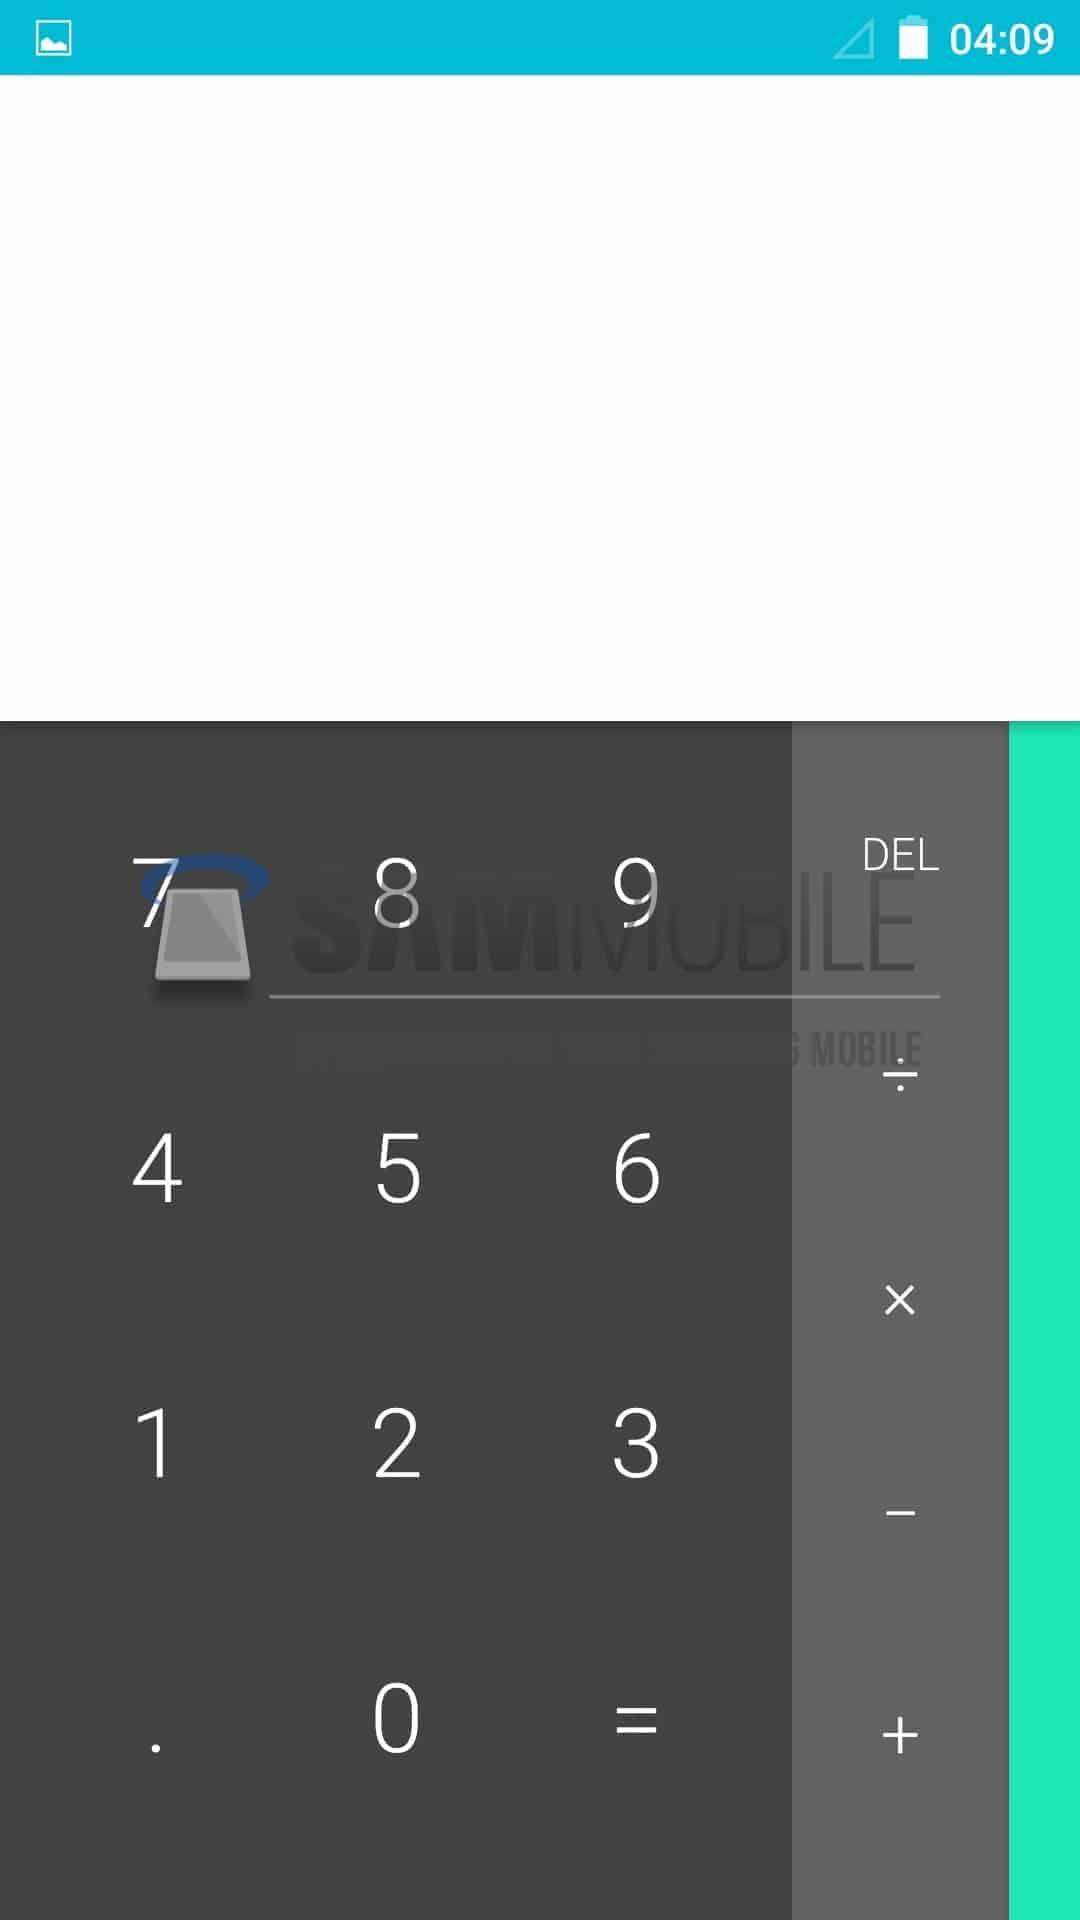 Samsung Galaxy S4 Lollipop beta4